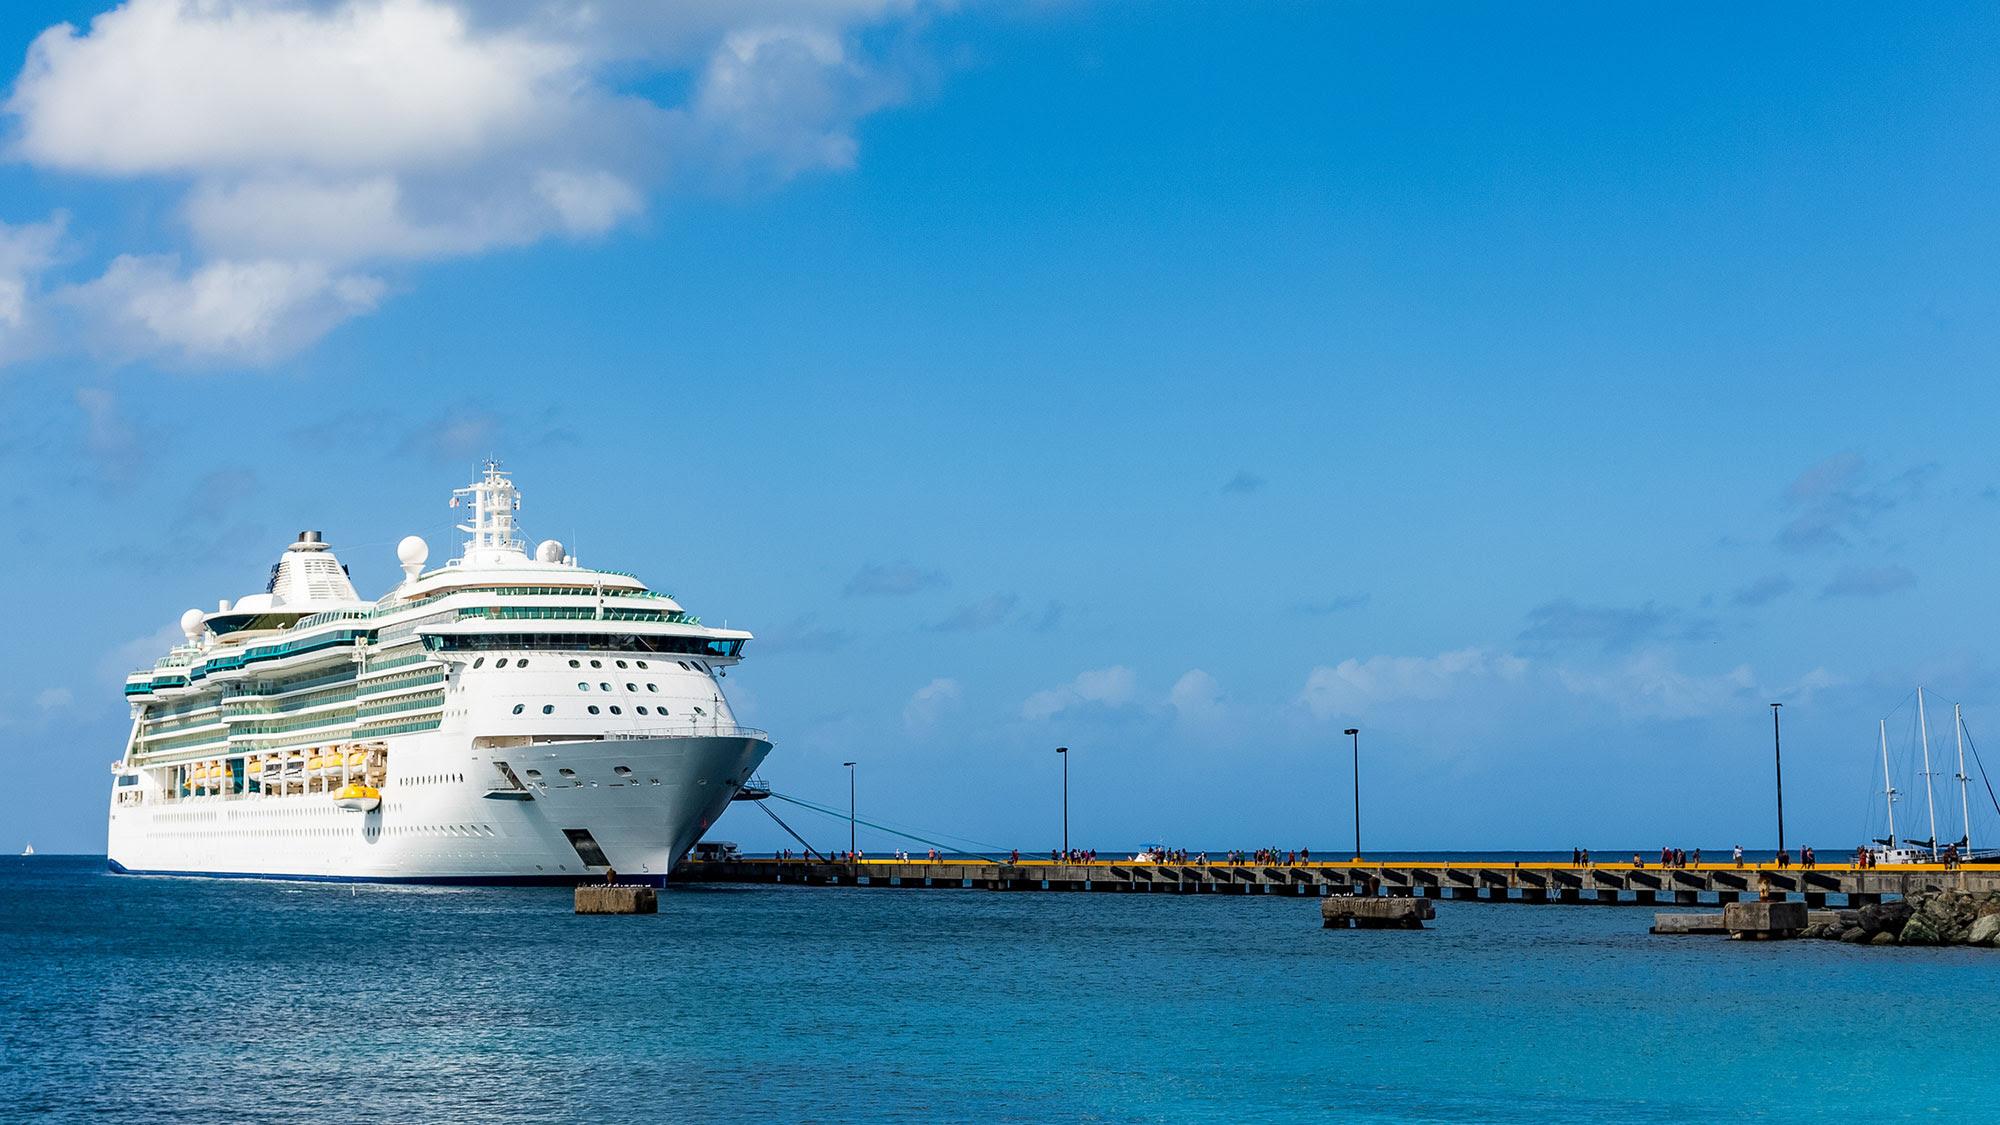 St Croix cruise pier